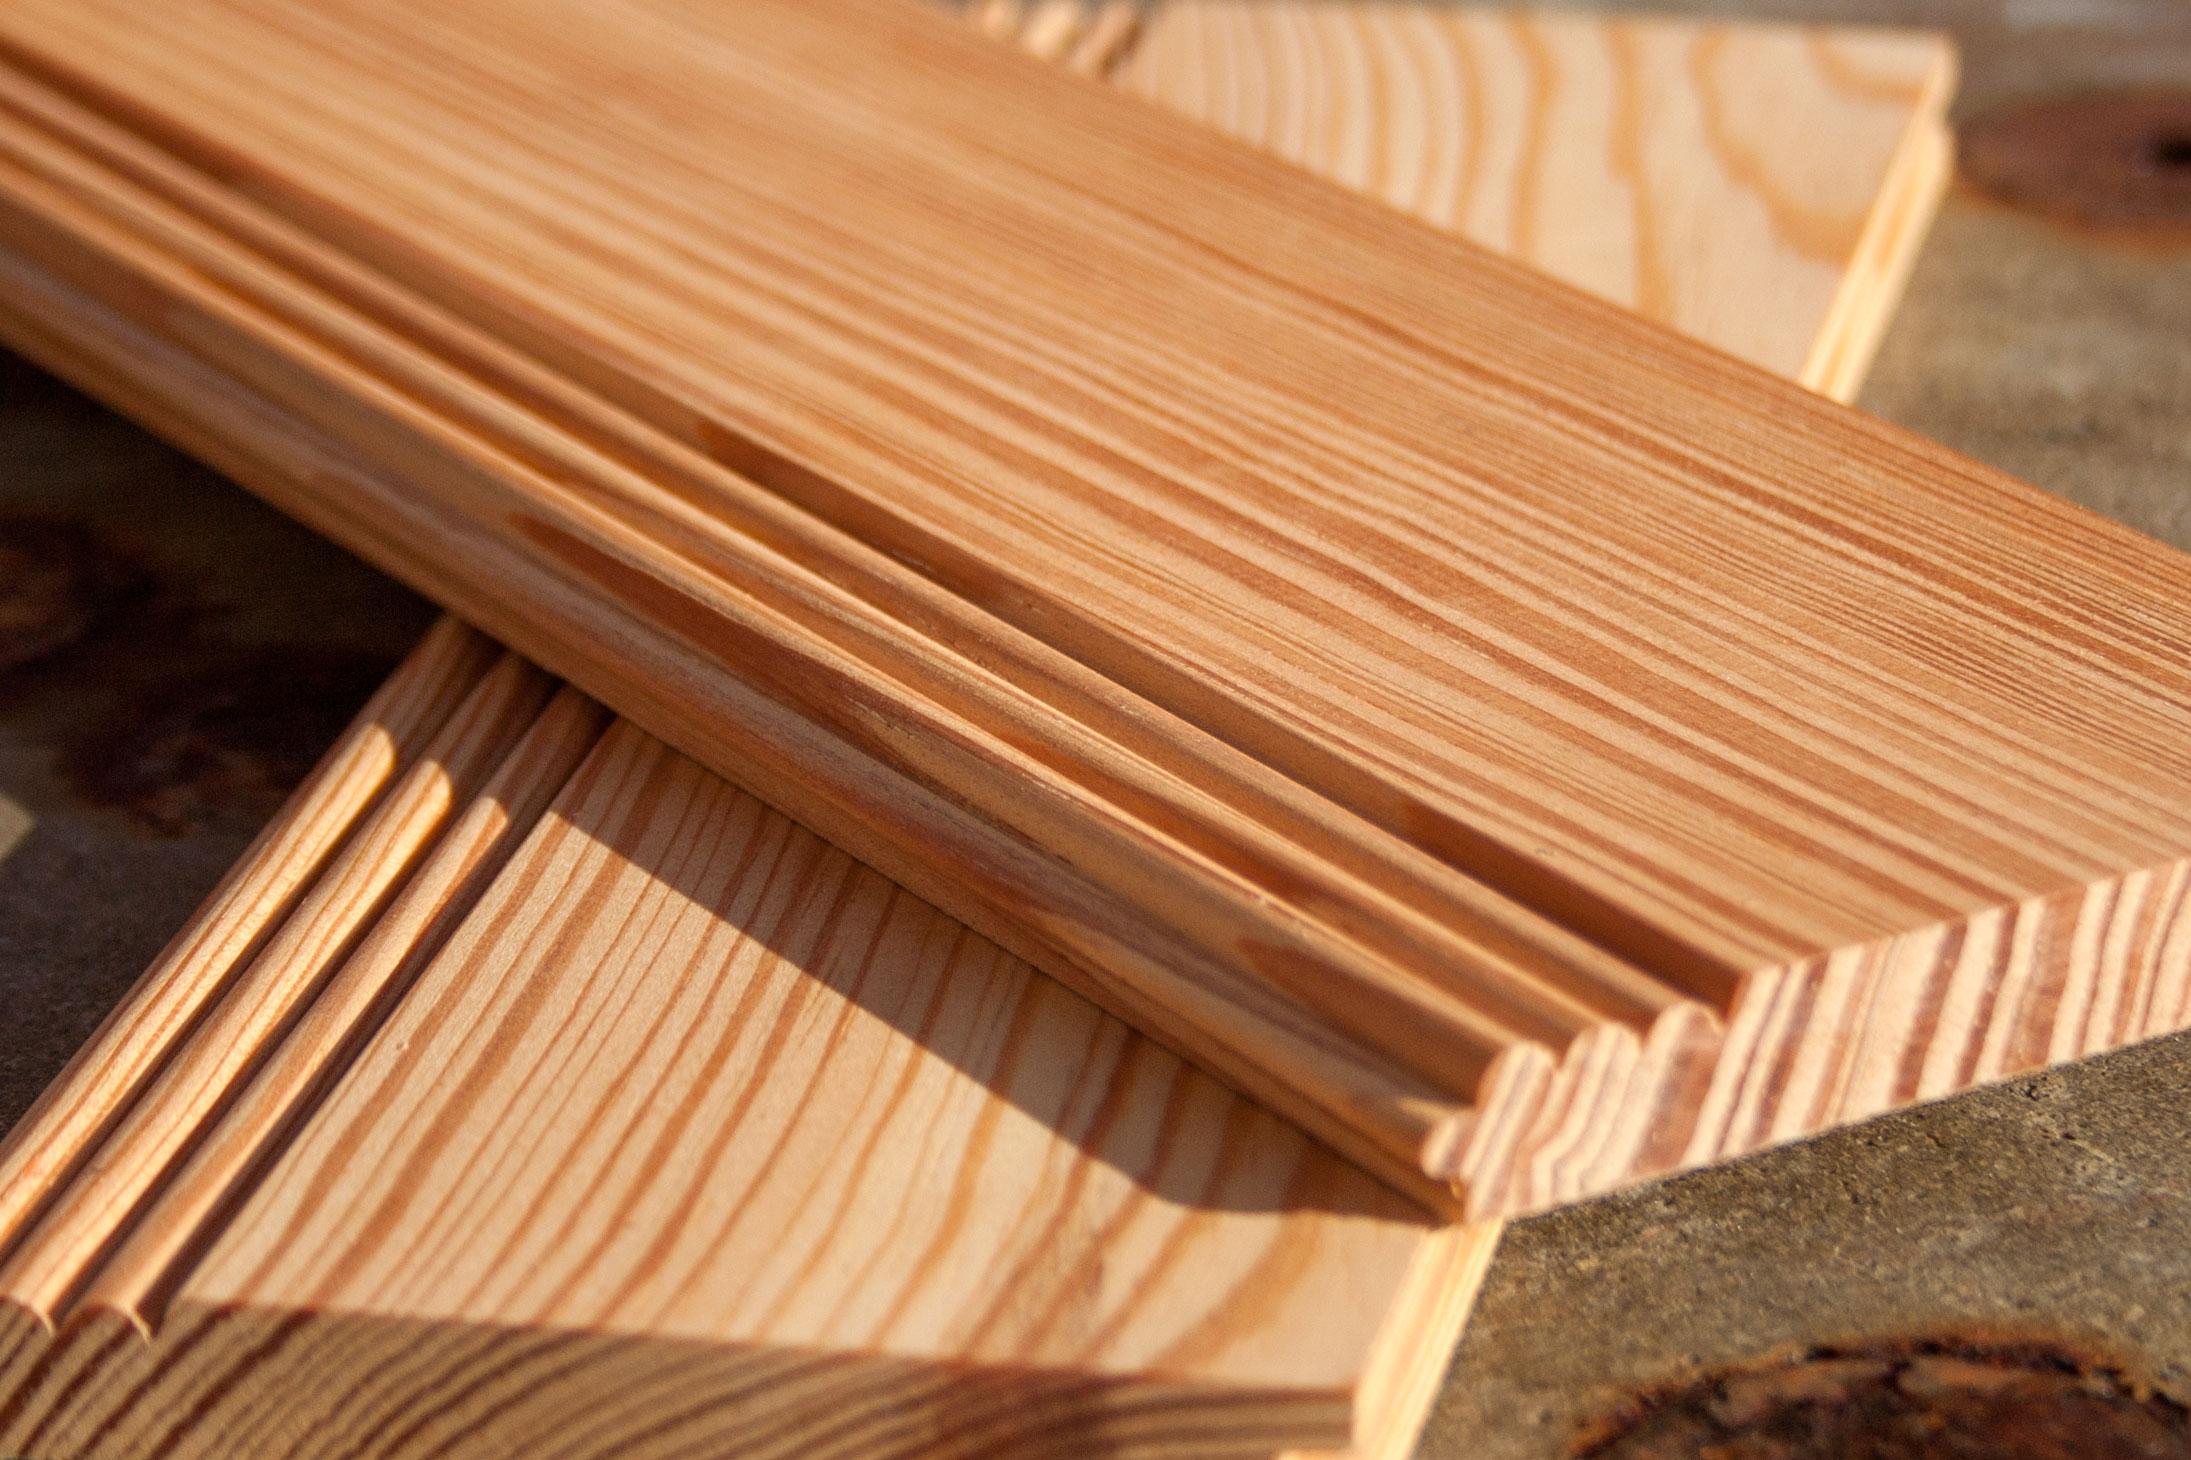 Longleaf Lumber  Reclaimed and Salvaged Wood Paneling